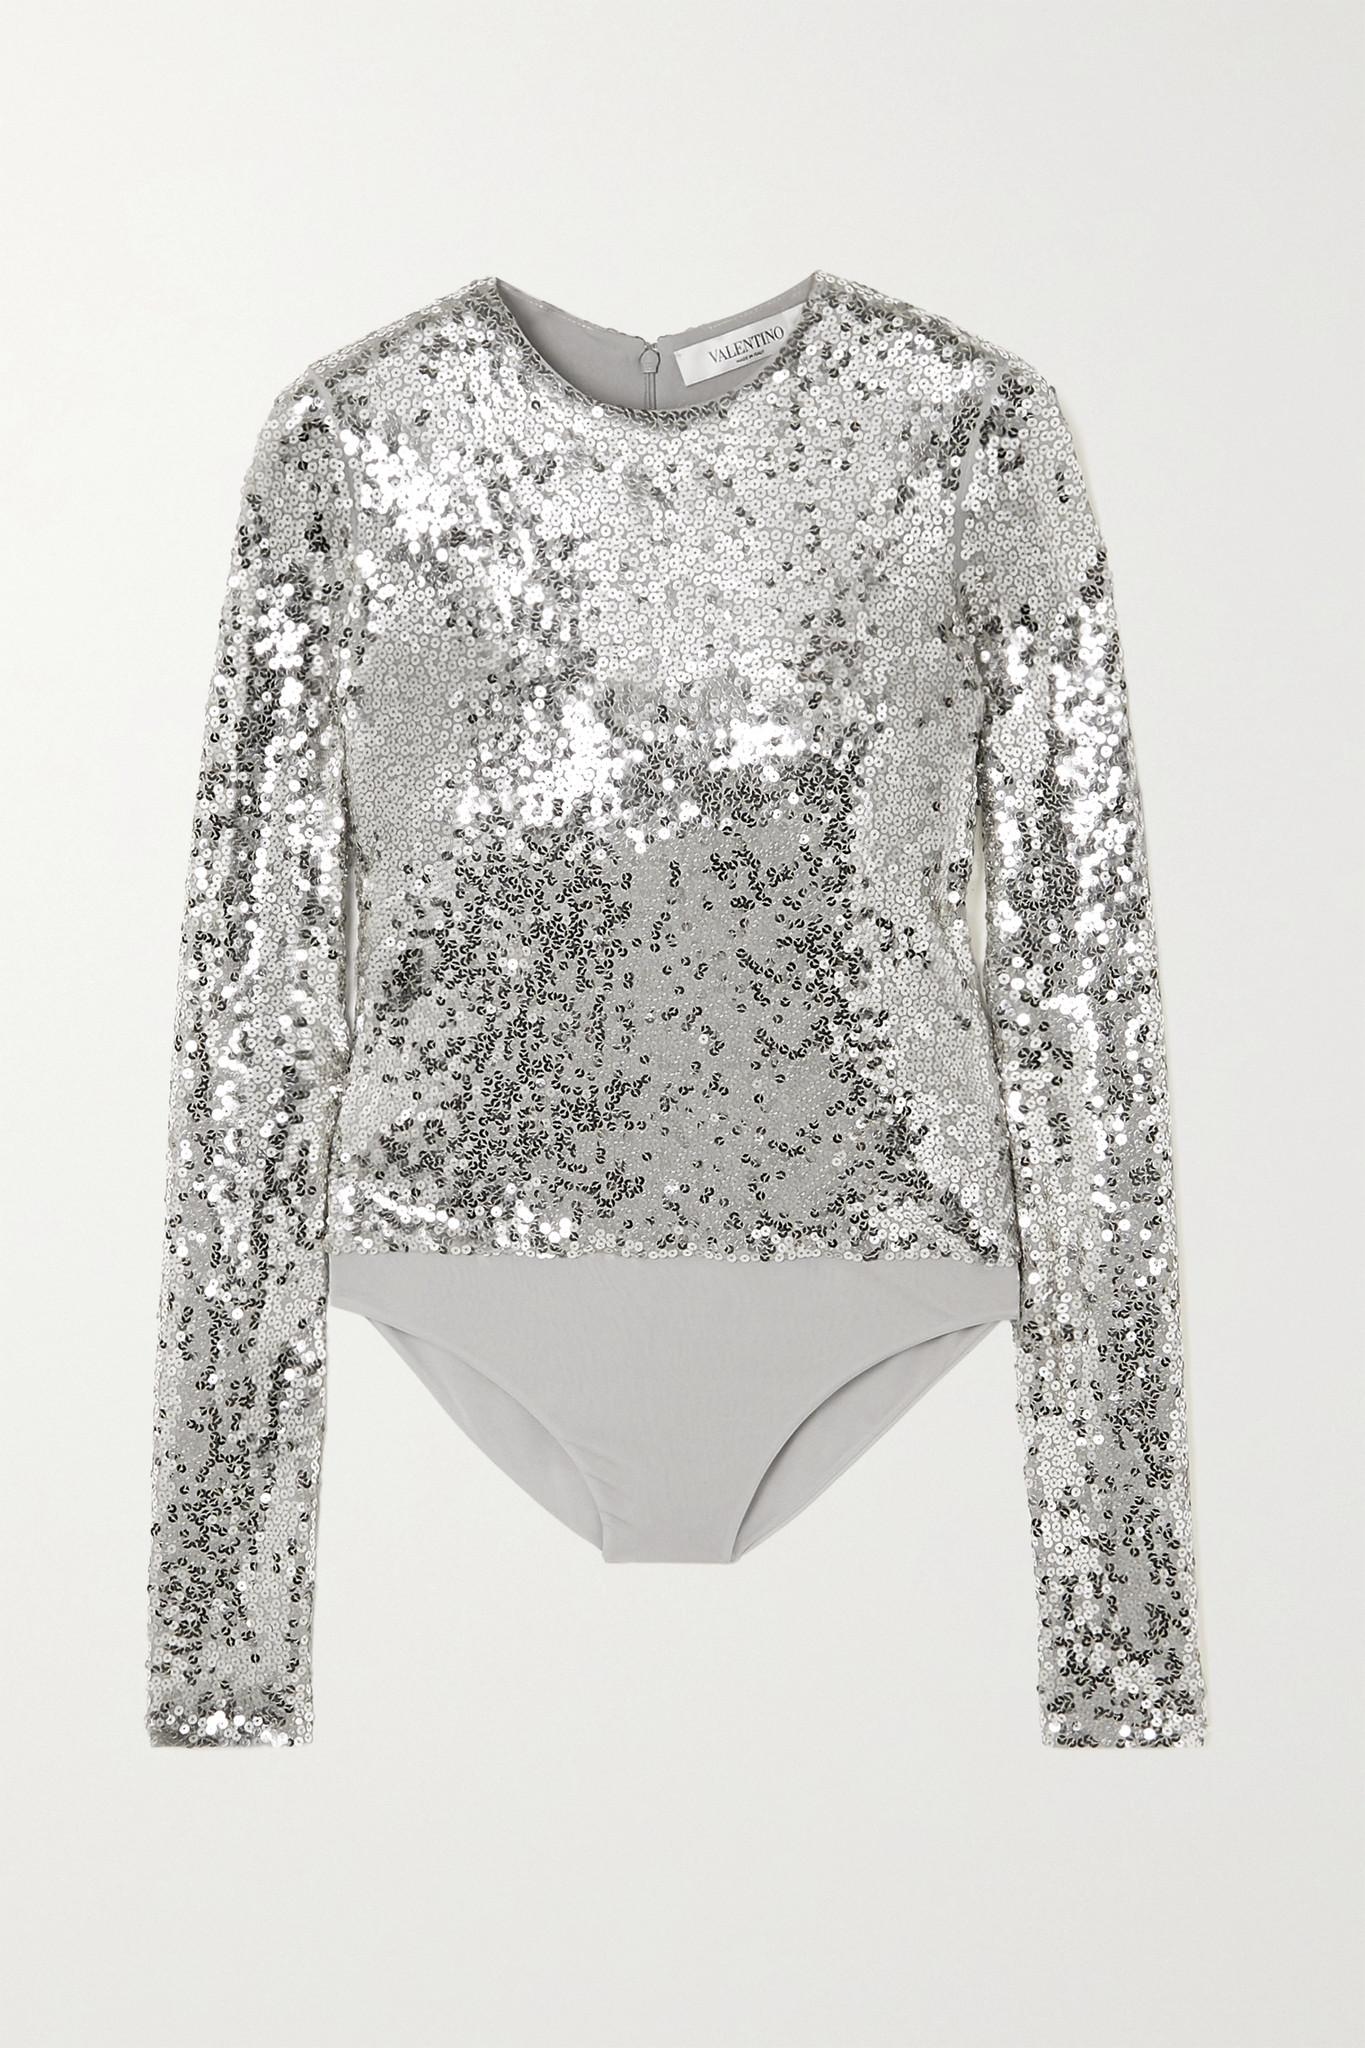 VALENTINO - 亮片平纹布连体紧身衣 - 银色 - x small